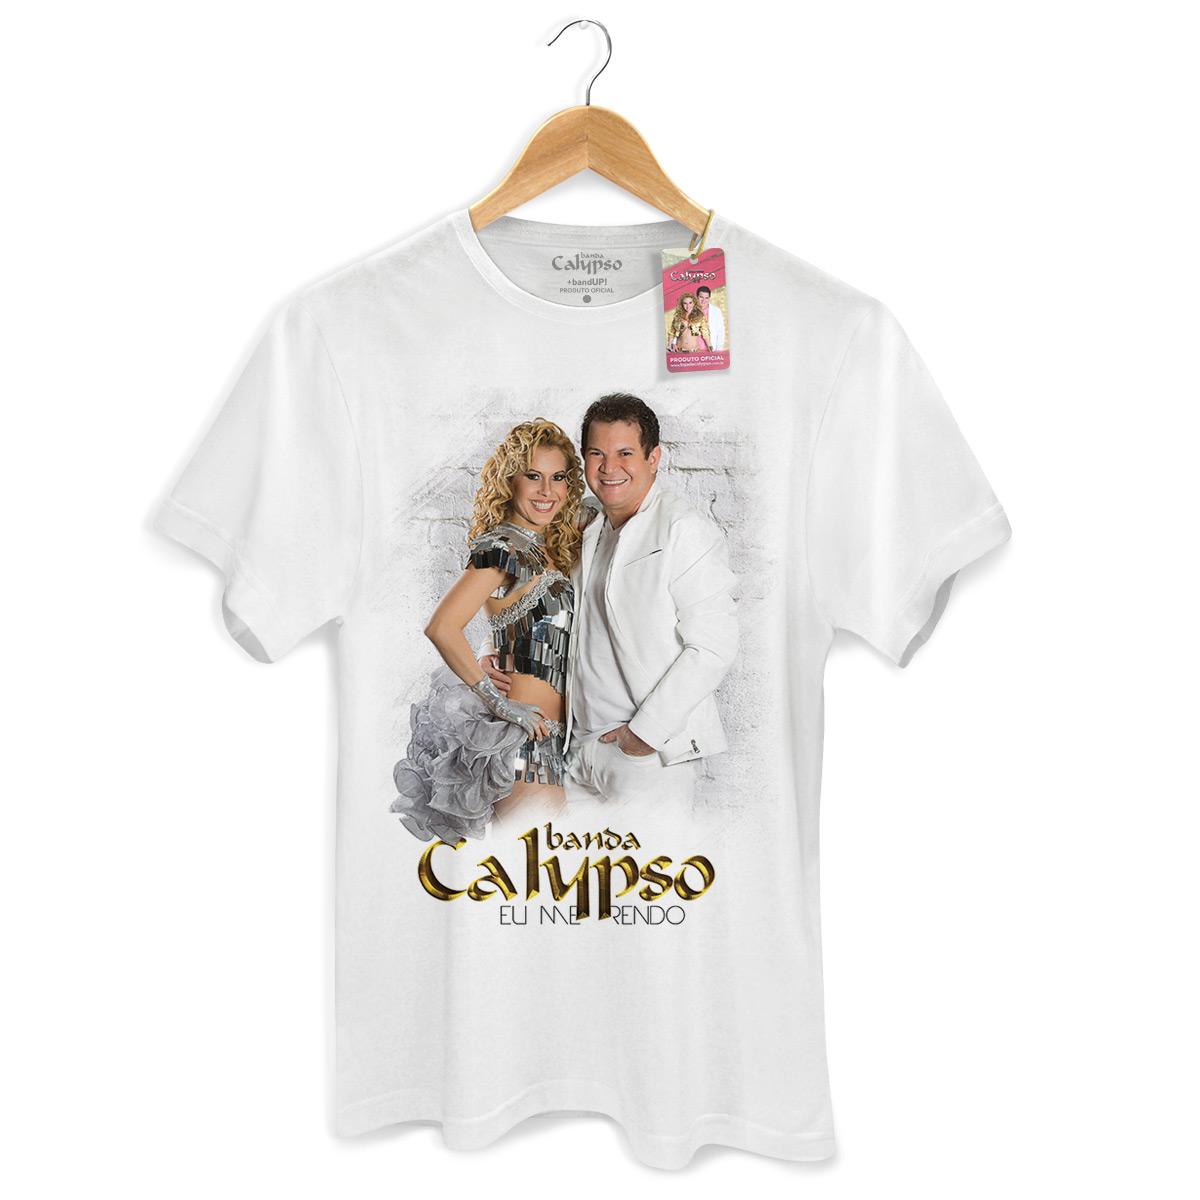 Camiseta Masculina Calypso - Capa